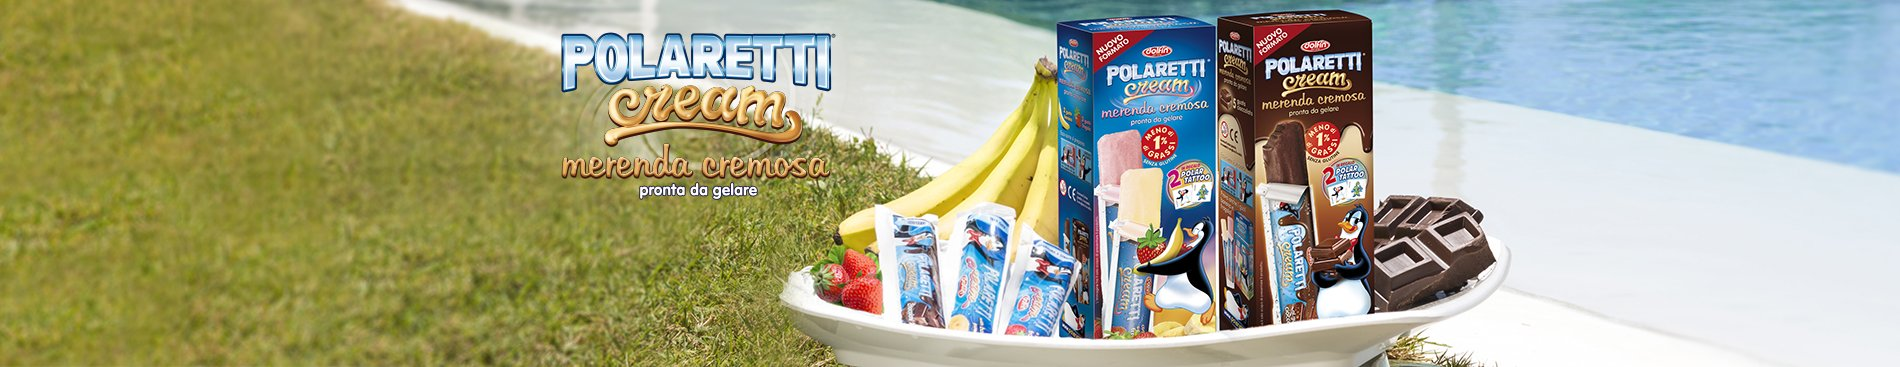 2016 Polaretti Cream